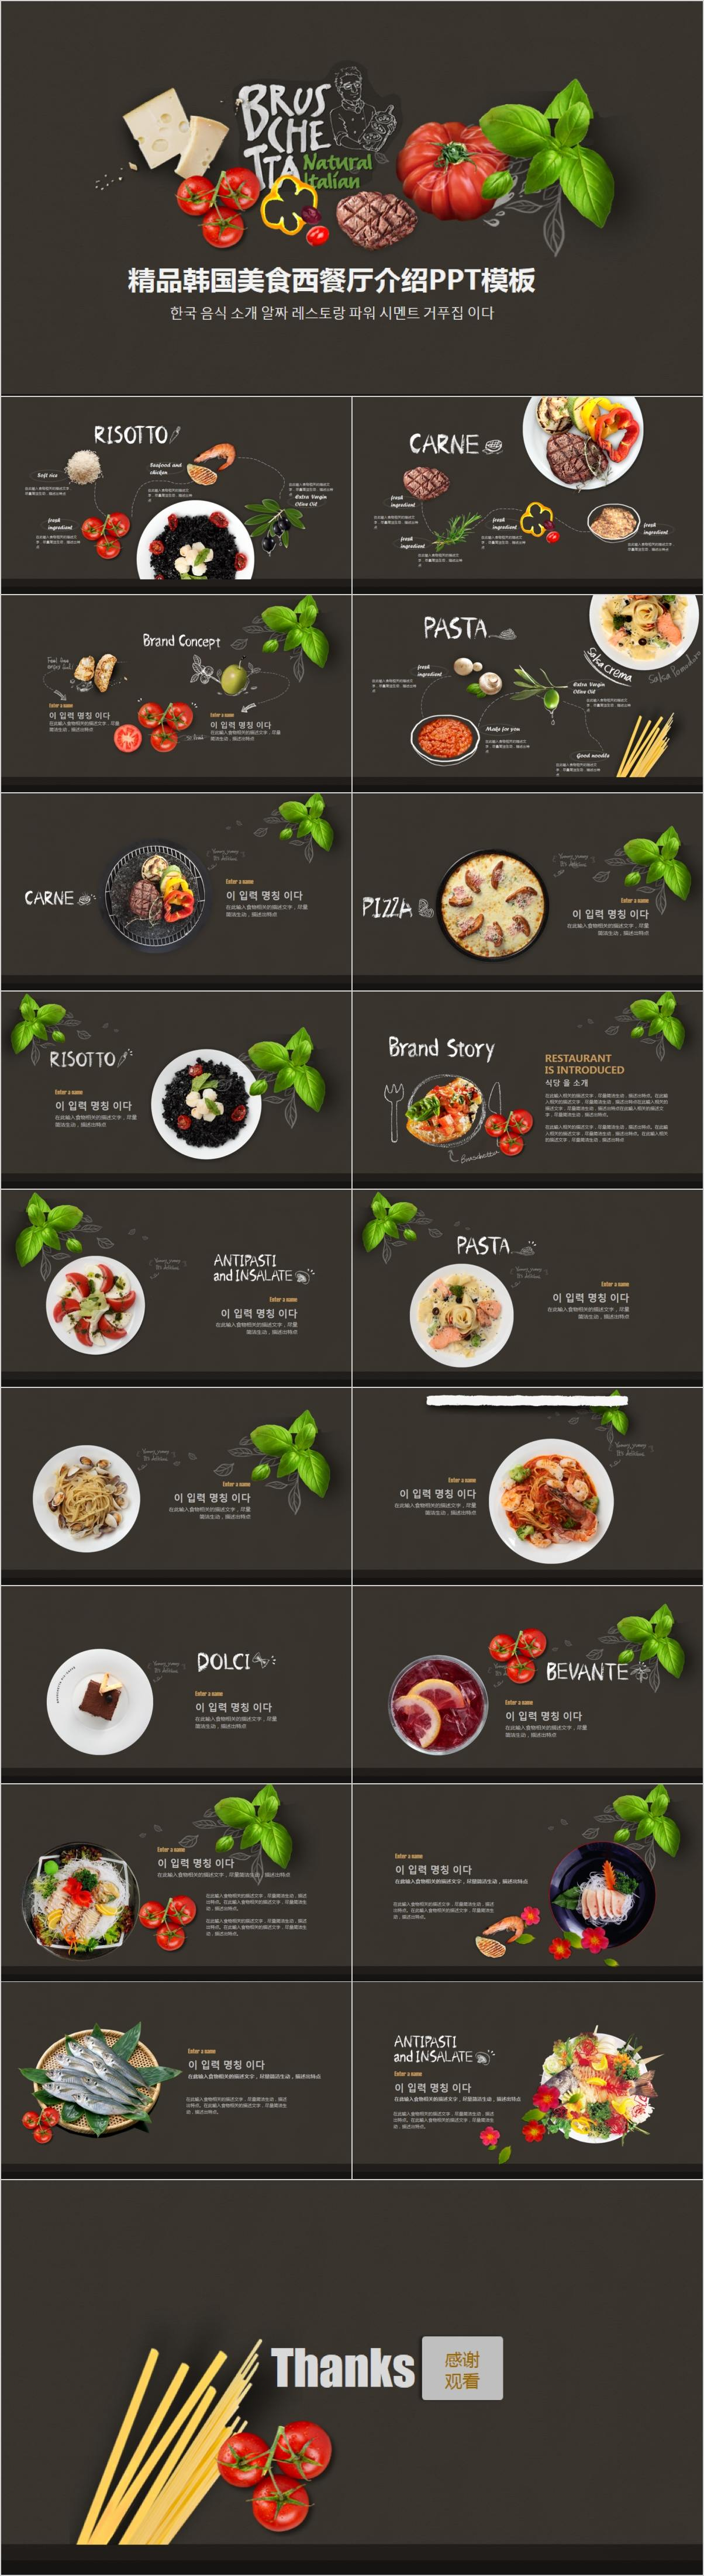 BC0058 精品韩国美食西餐厅介绍PPT模板